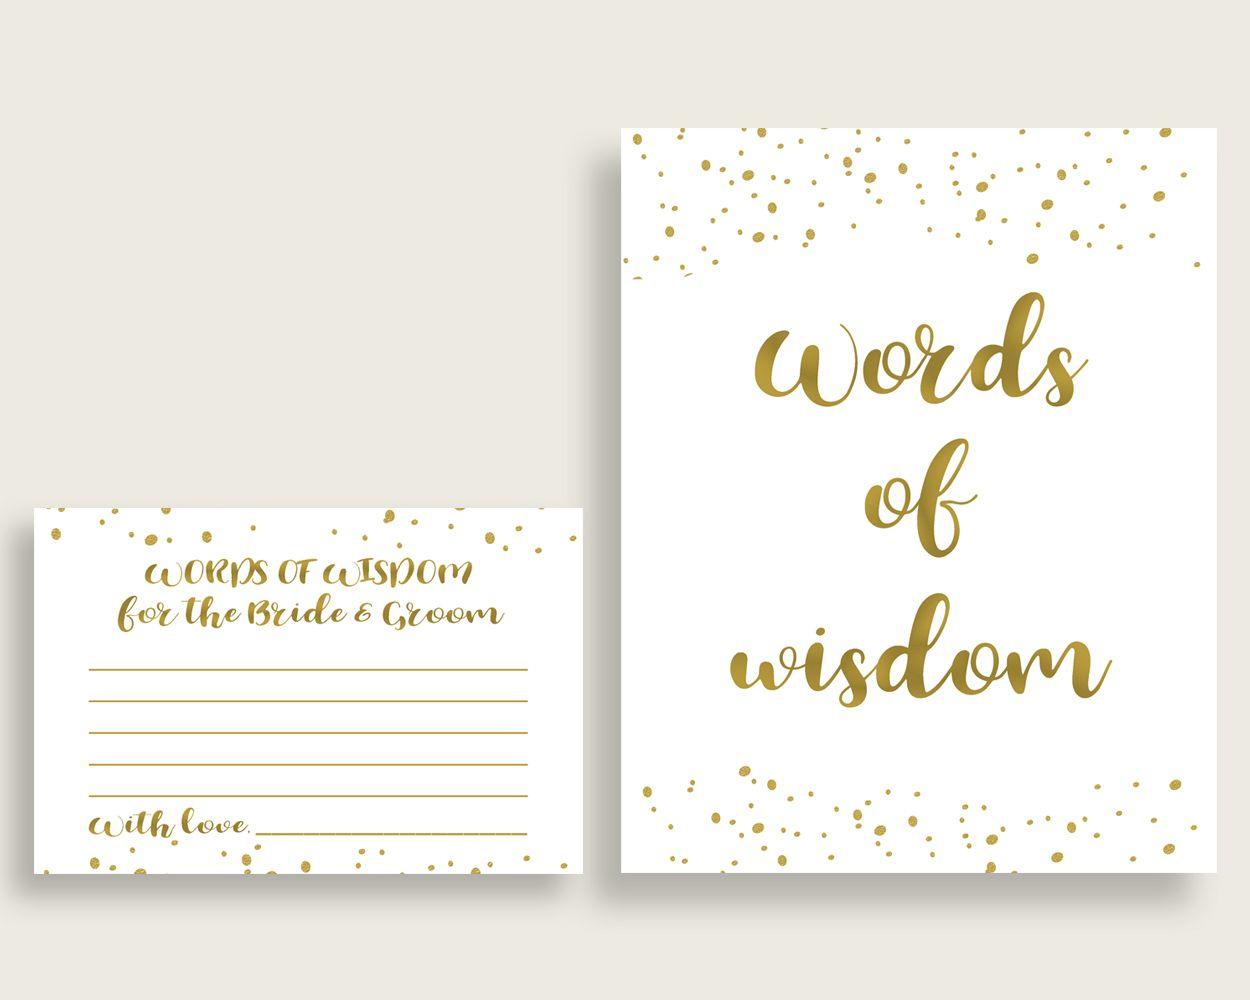 words of wisdom bridal shower words of wisdom gold bridal shower words of wisdom bridal shower gold words of wisdom gold white paper g2znx bridalshower